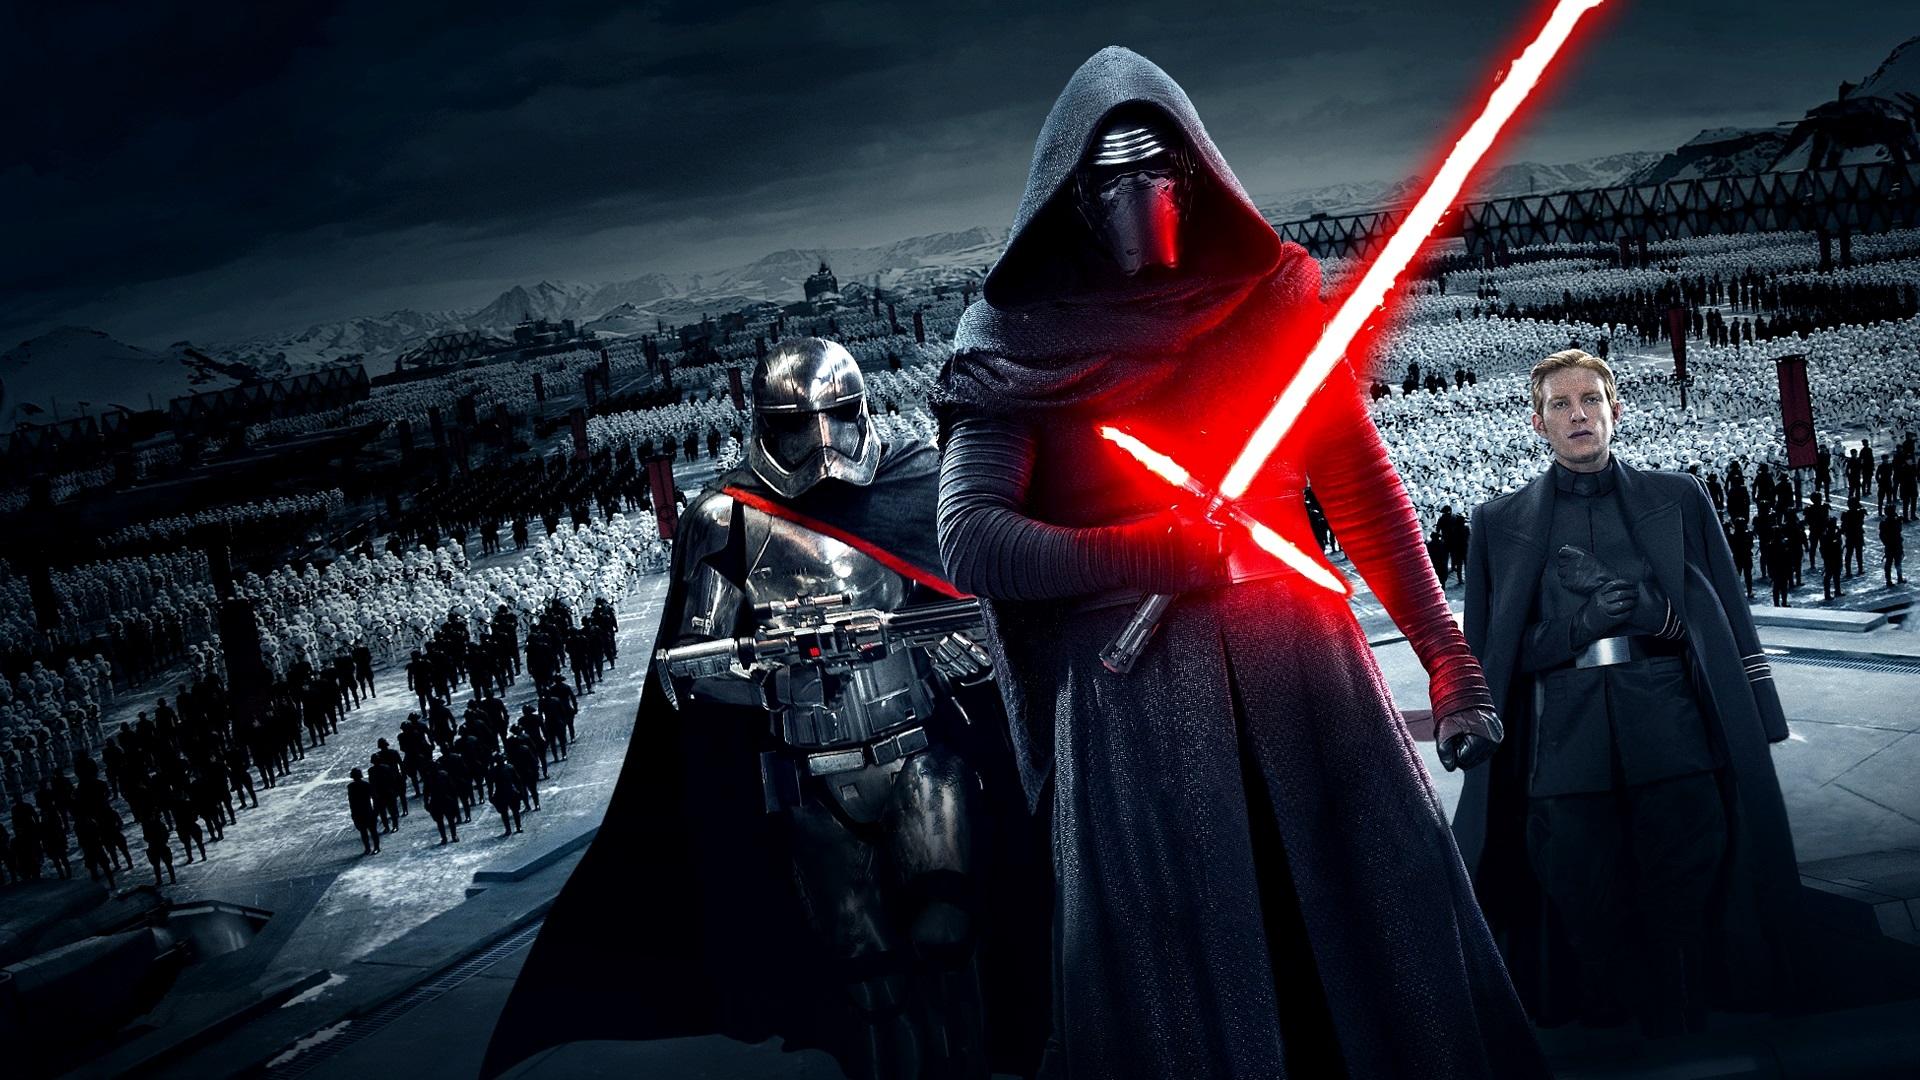 star wars empire wallpaper hd - photo #30